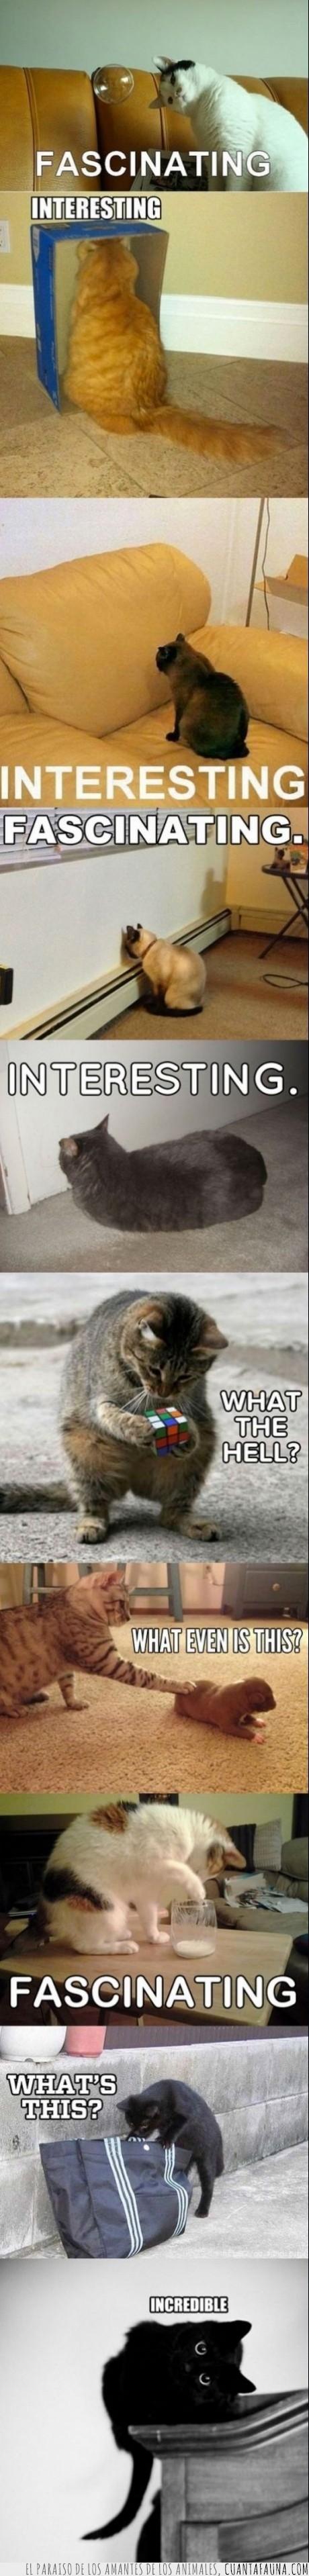 burbuja de jabon,cachorro,caja,curiosidad,curioso,fascinante,gato,interesante,pared,tiernos